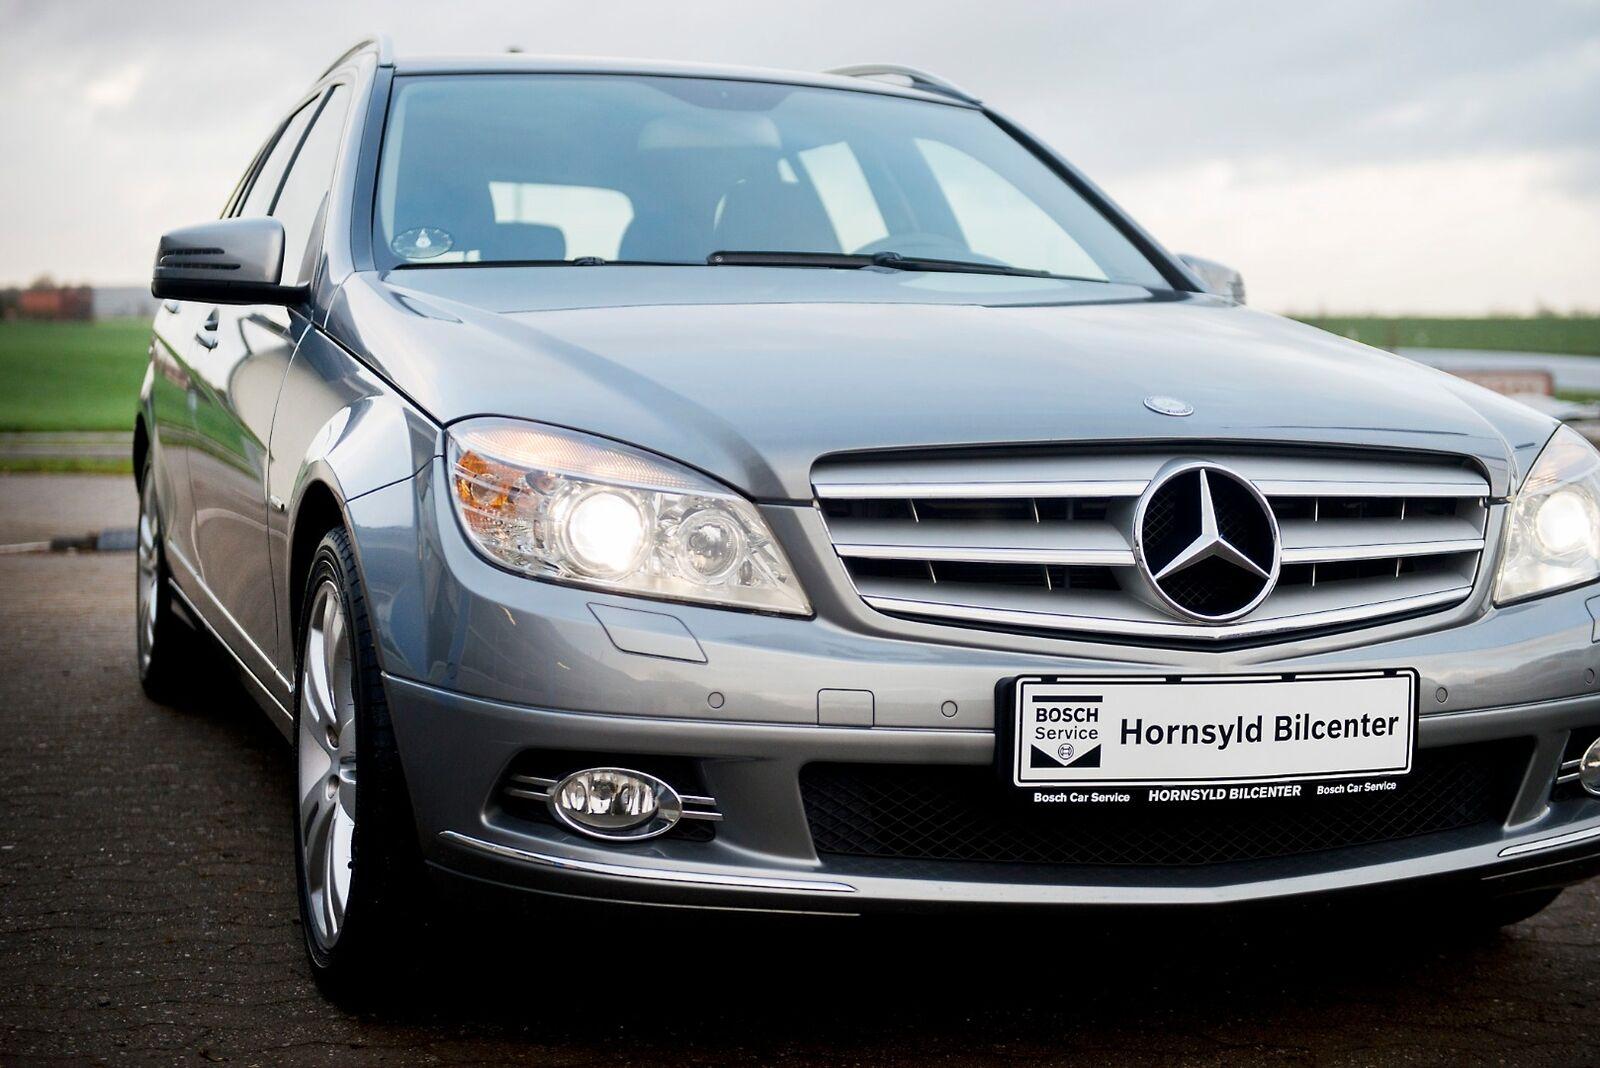 Mercedes C230 2,5 V6 Classic stc. 5d - 149.900 kr.